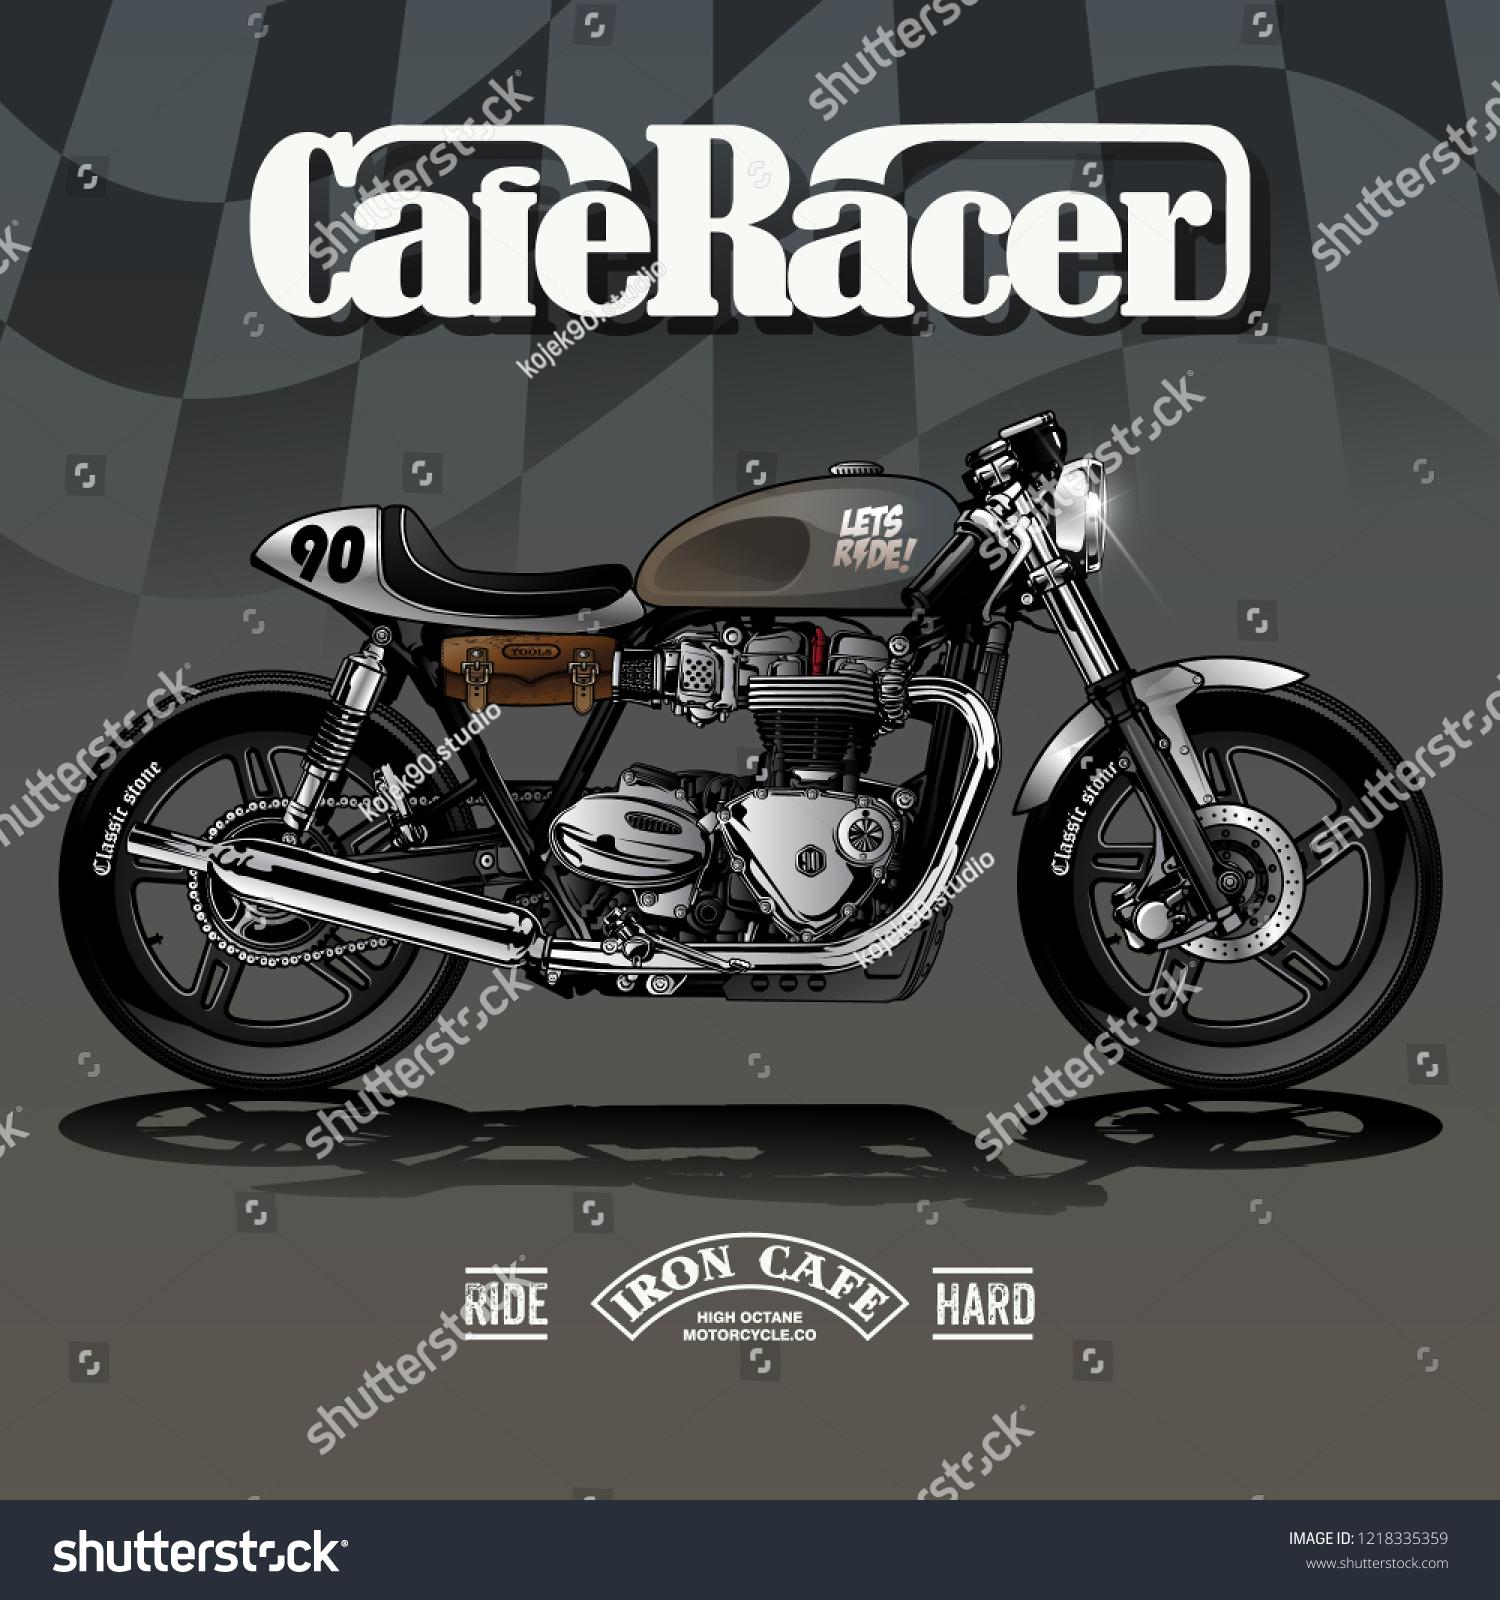 Vintage Cafe Racer Poster Design Stock Vector Royalty Free 1218335359